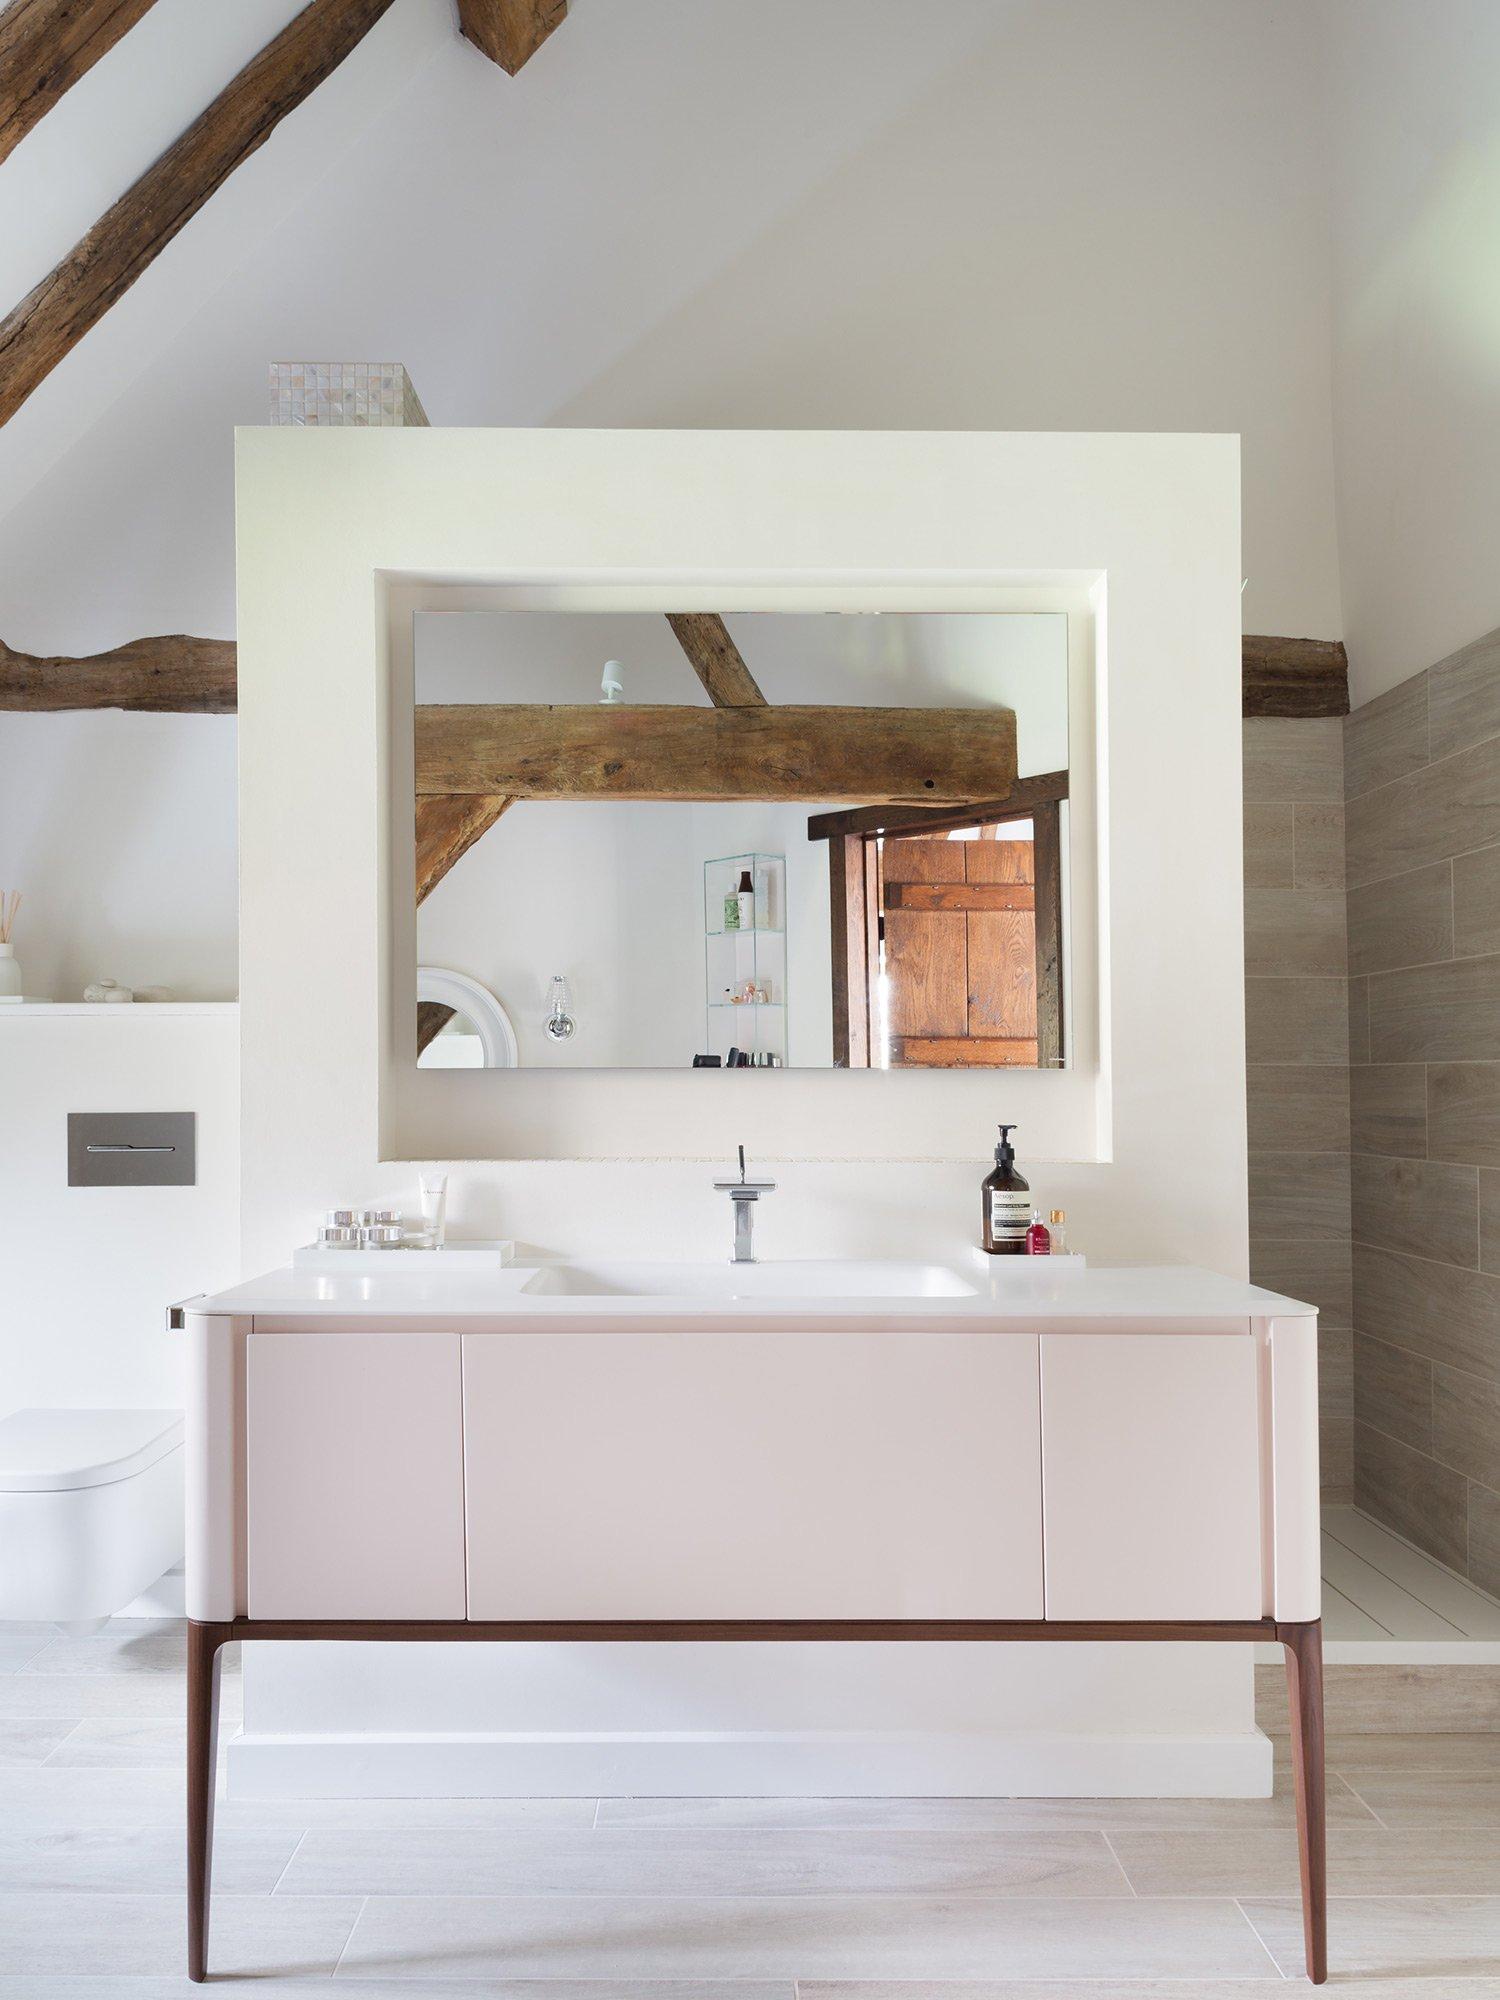 West One Bathrooms Case Studies Sussex 4